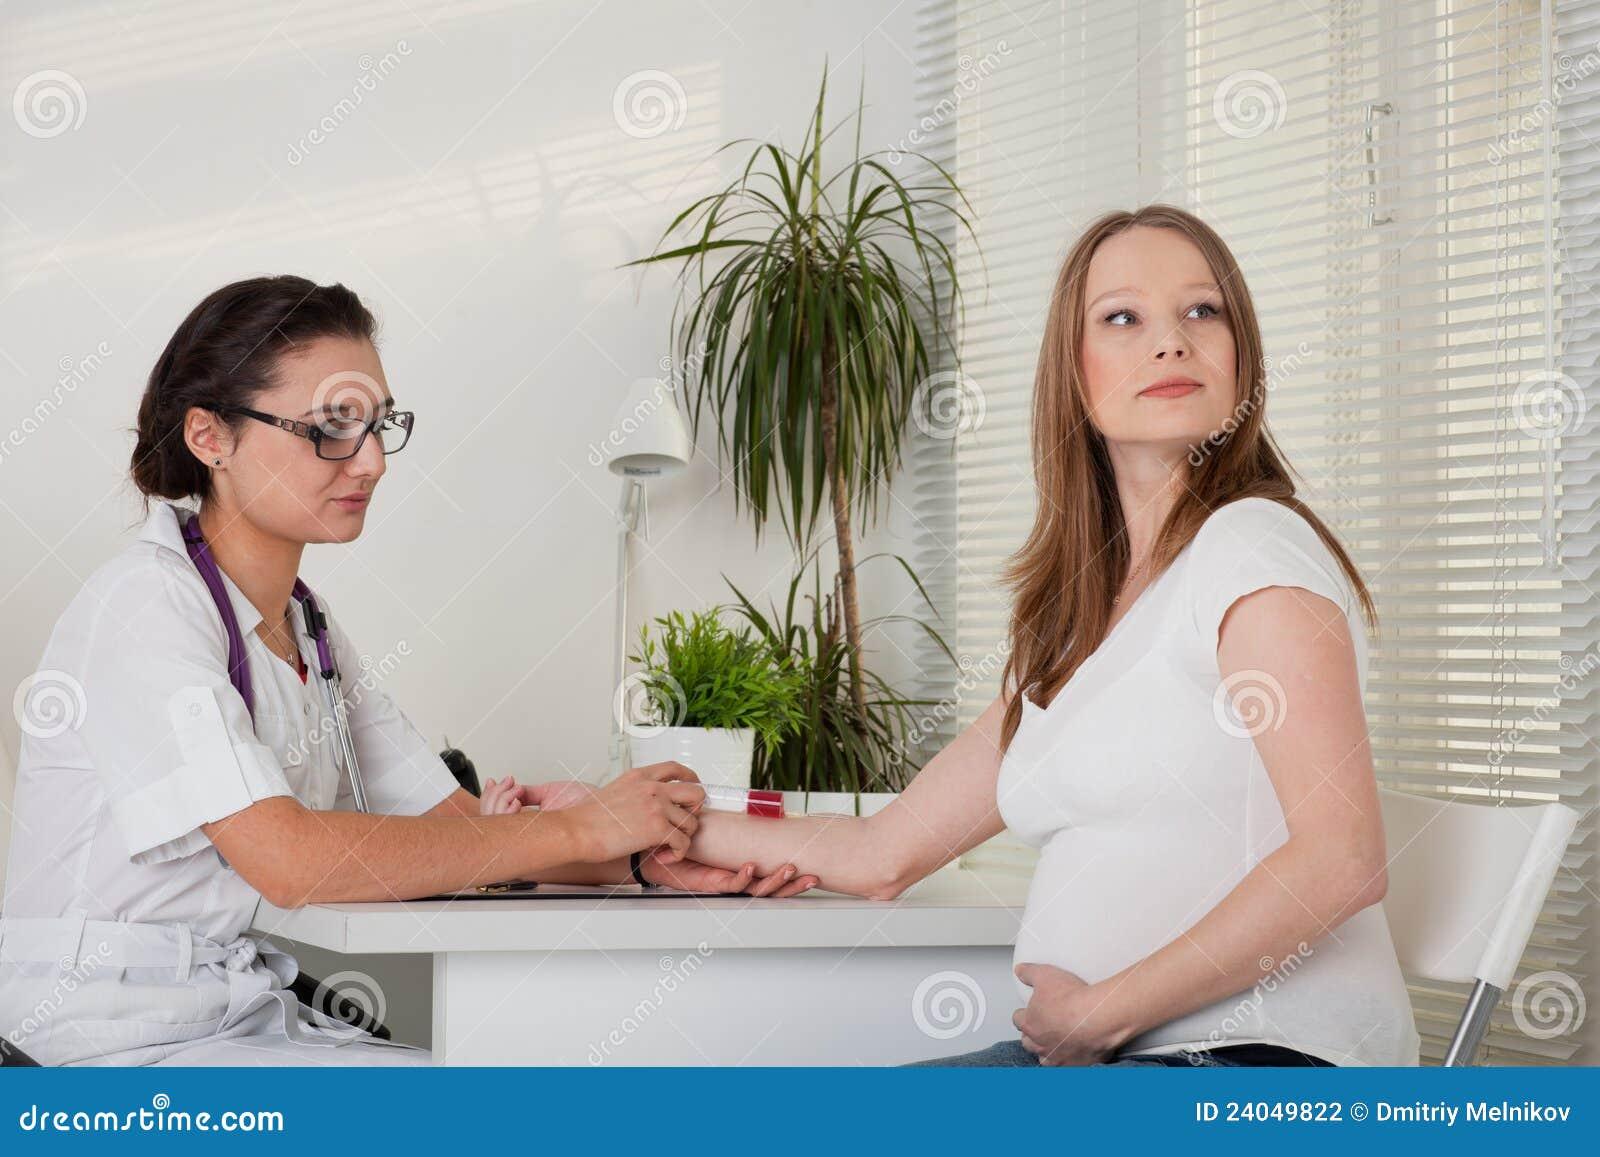 Студентки на приёме у врача 4 фотография